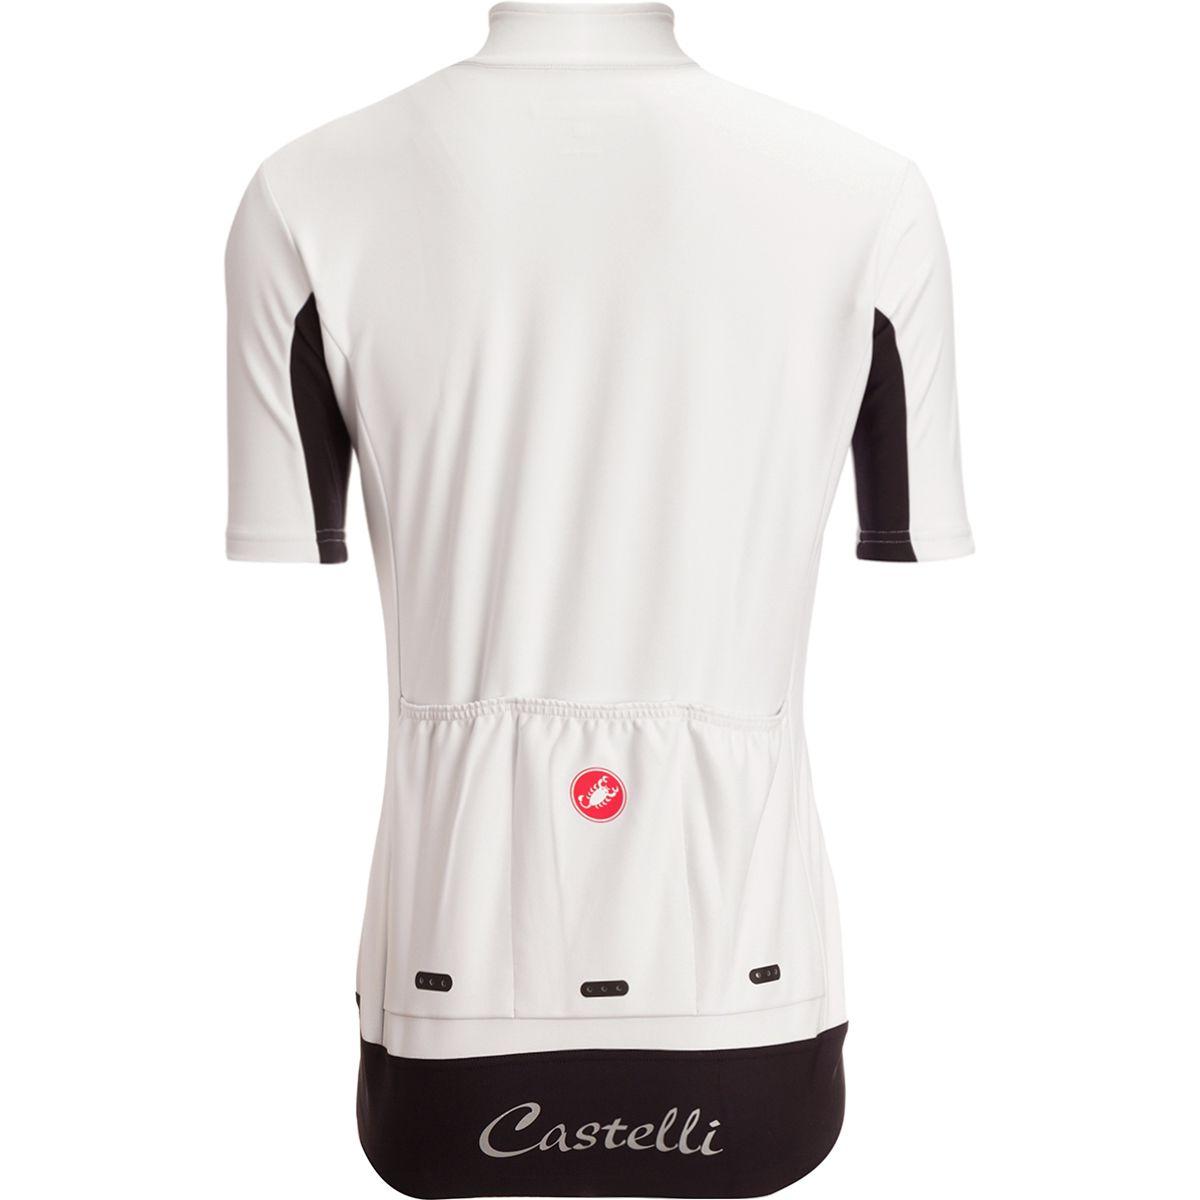 0185a75d1 Castelli White 2018 Gabba 2 Womens Short Sleeved Cycling Jersey S